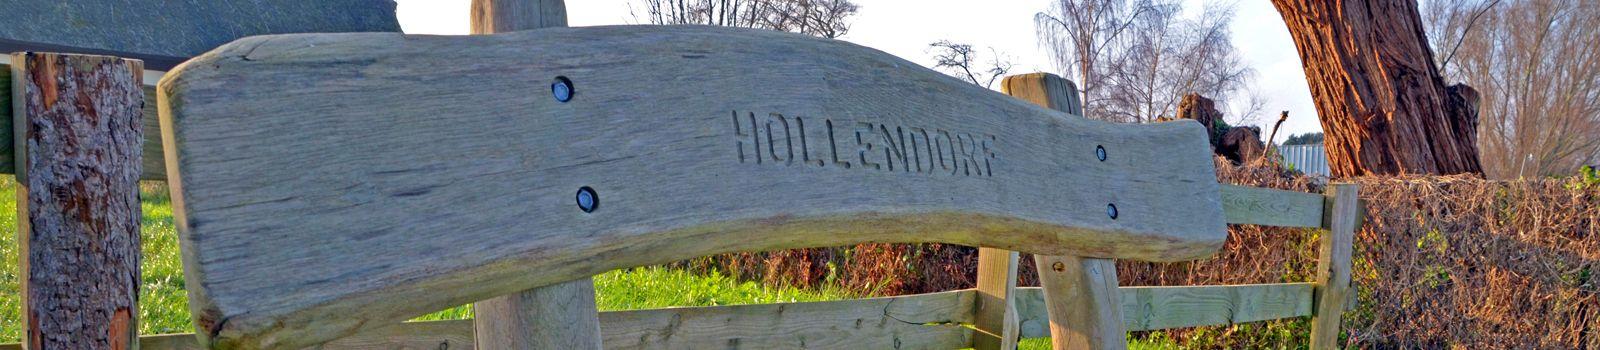 Hollendorf